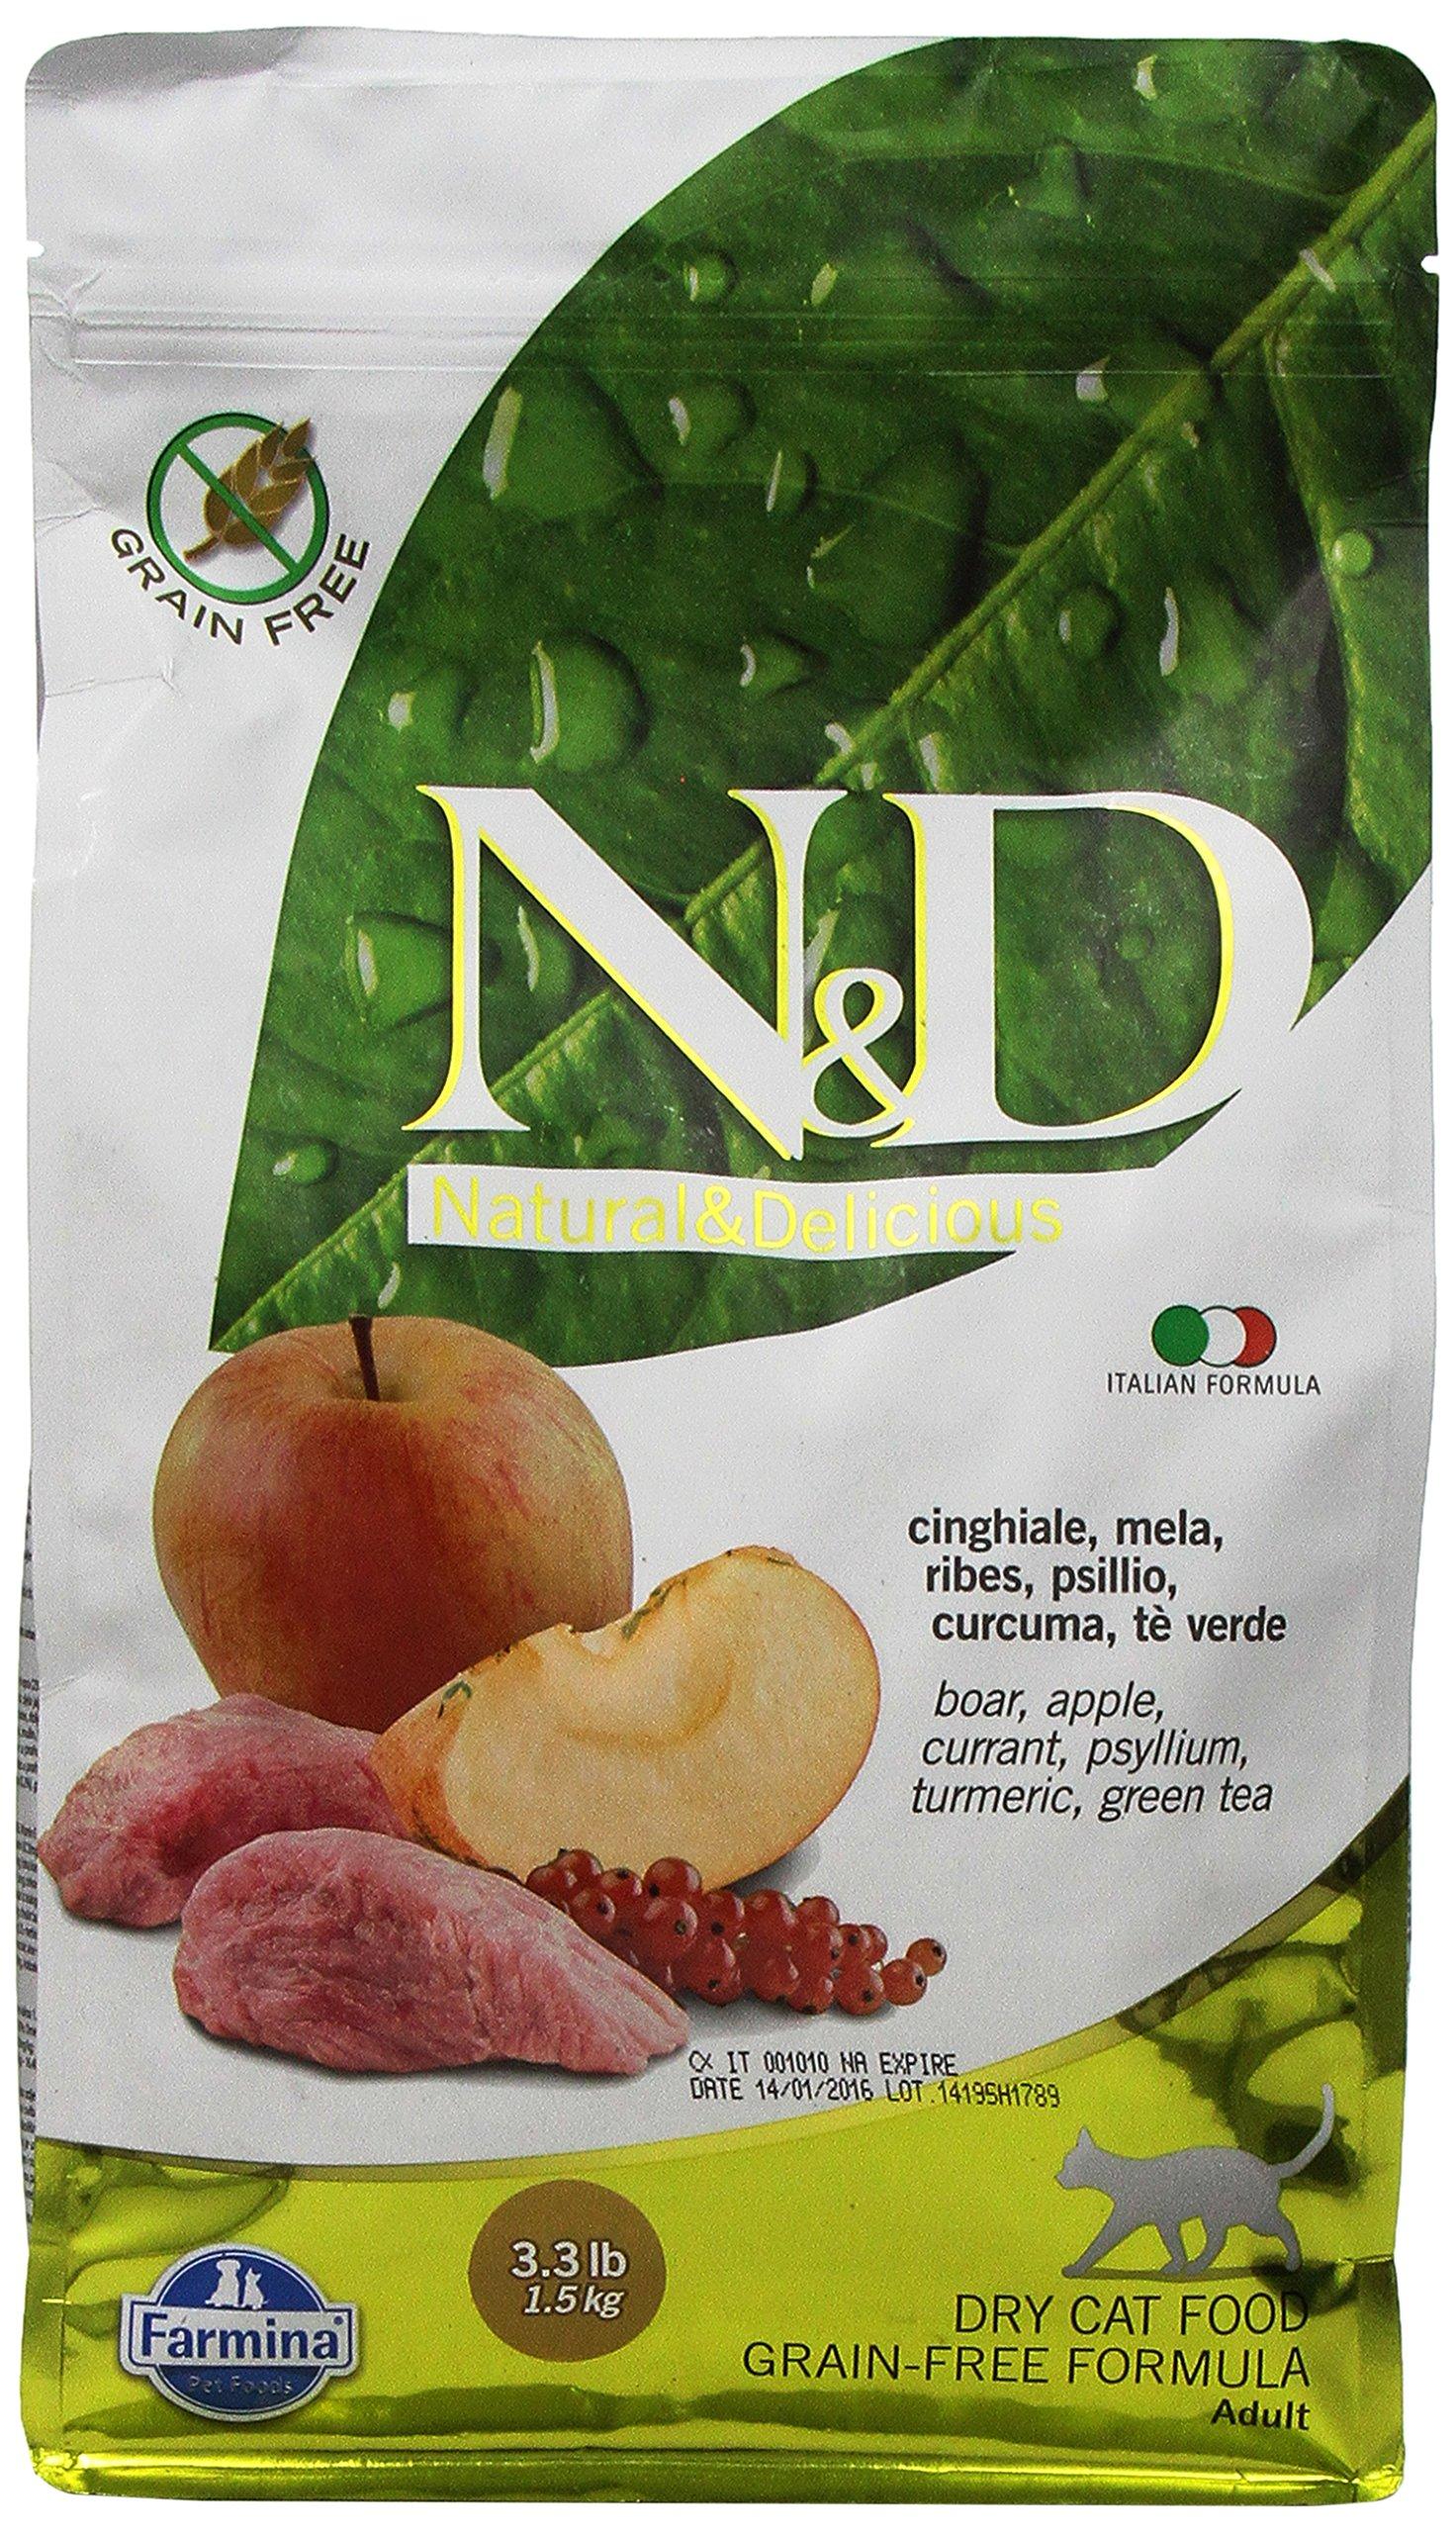 Farmina Natural and Delicious Boar and Apple Grain-Free Formula Dry Cat Food, 3.3 Pound Bag by Farmina (Image #1)